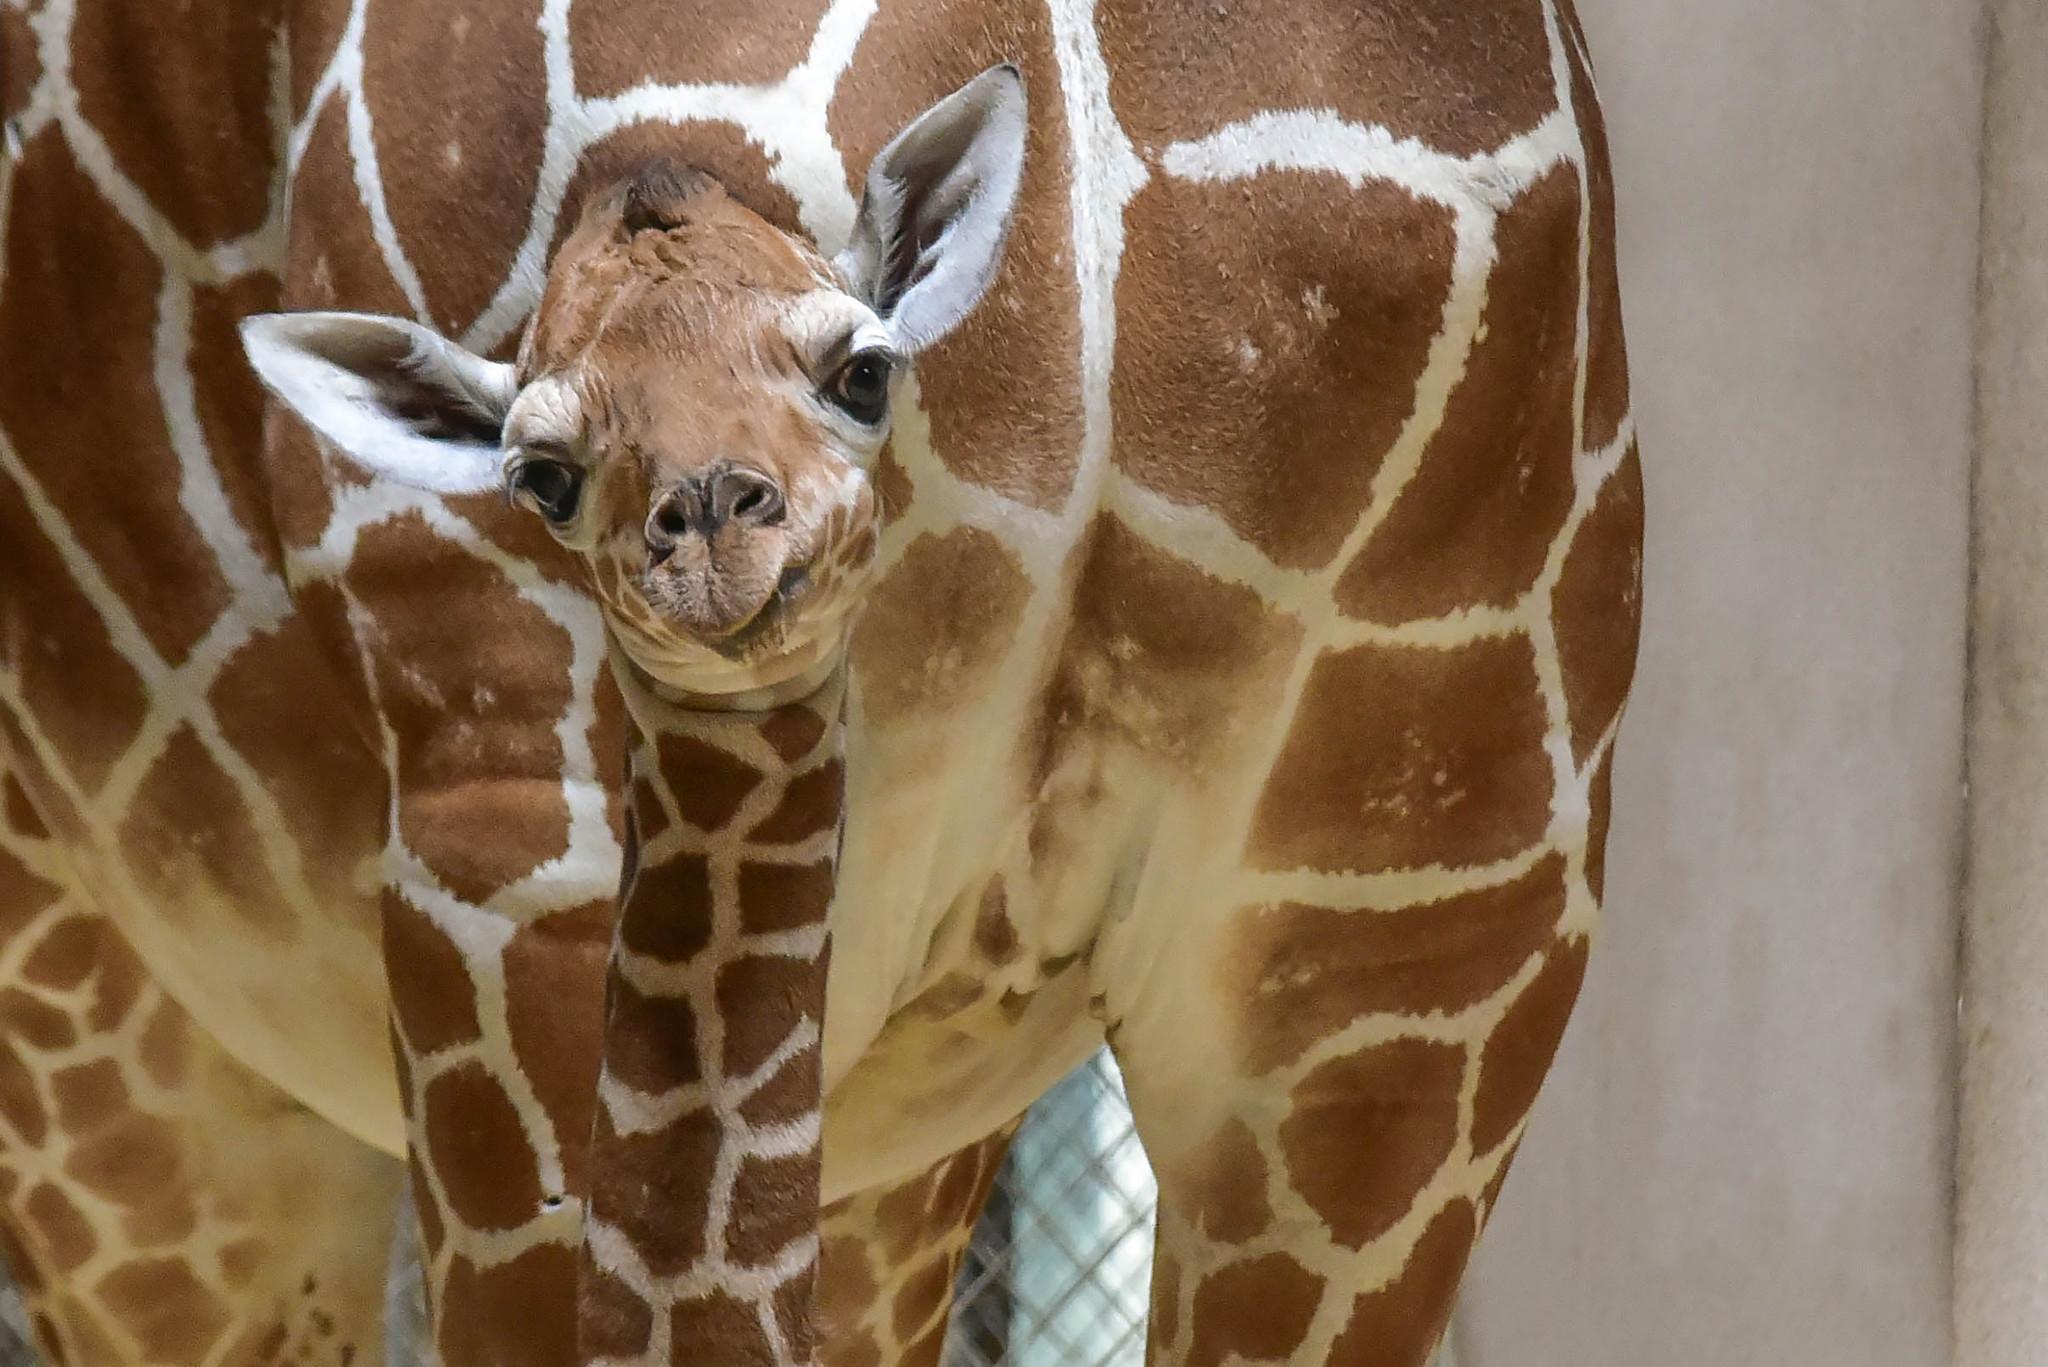 Baby giraffe at Maryland Zoo still struggling to gain ...